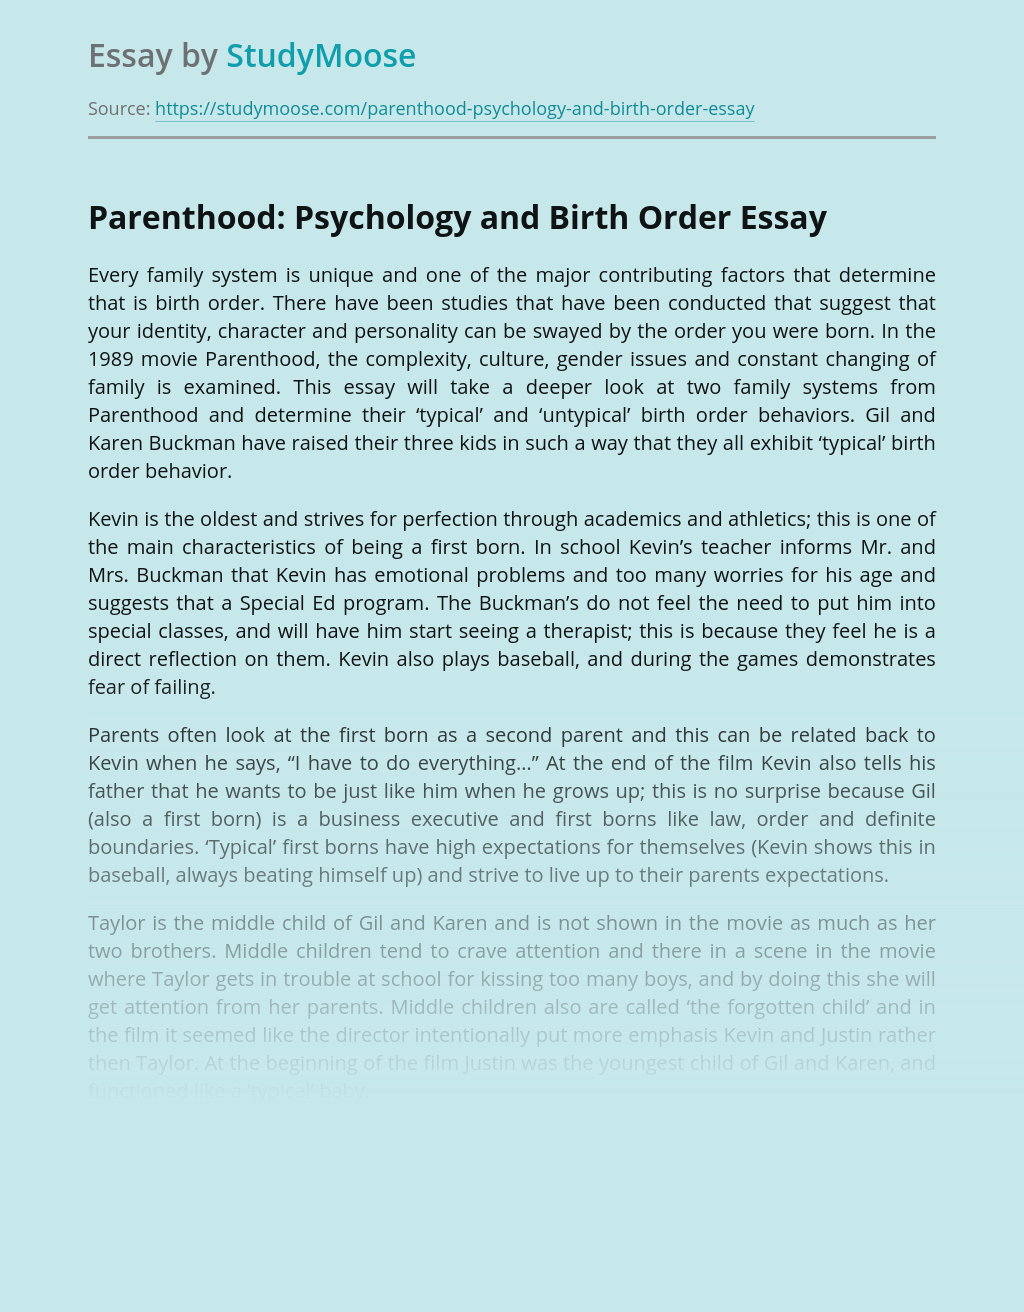 Parenthood: Psychology and Birth Order